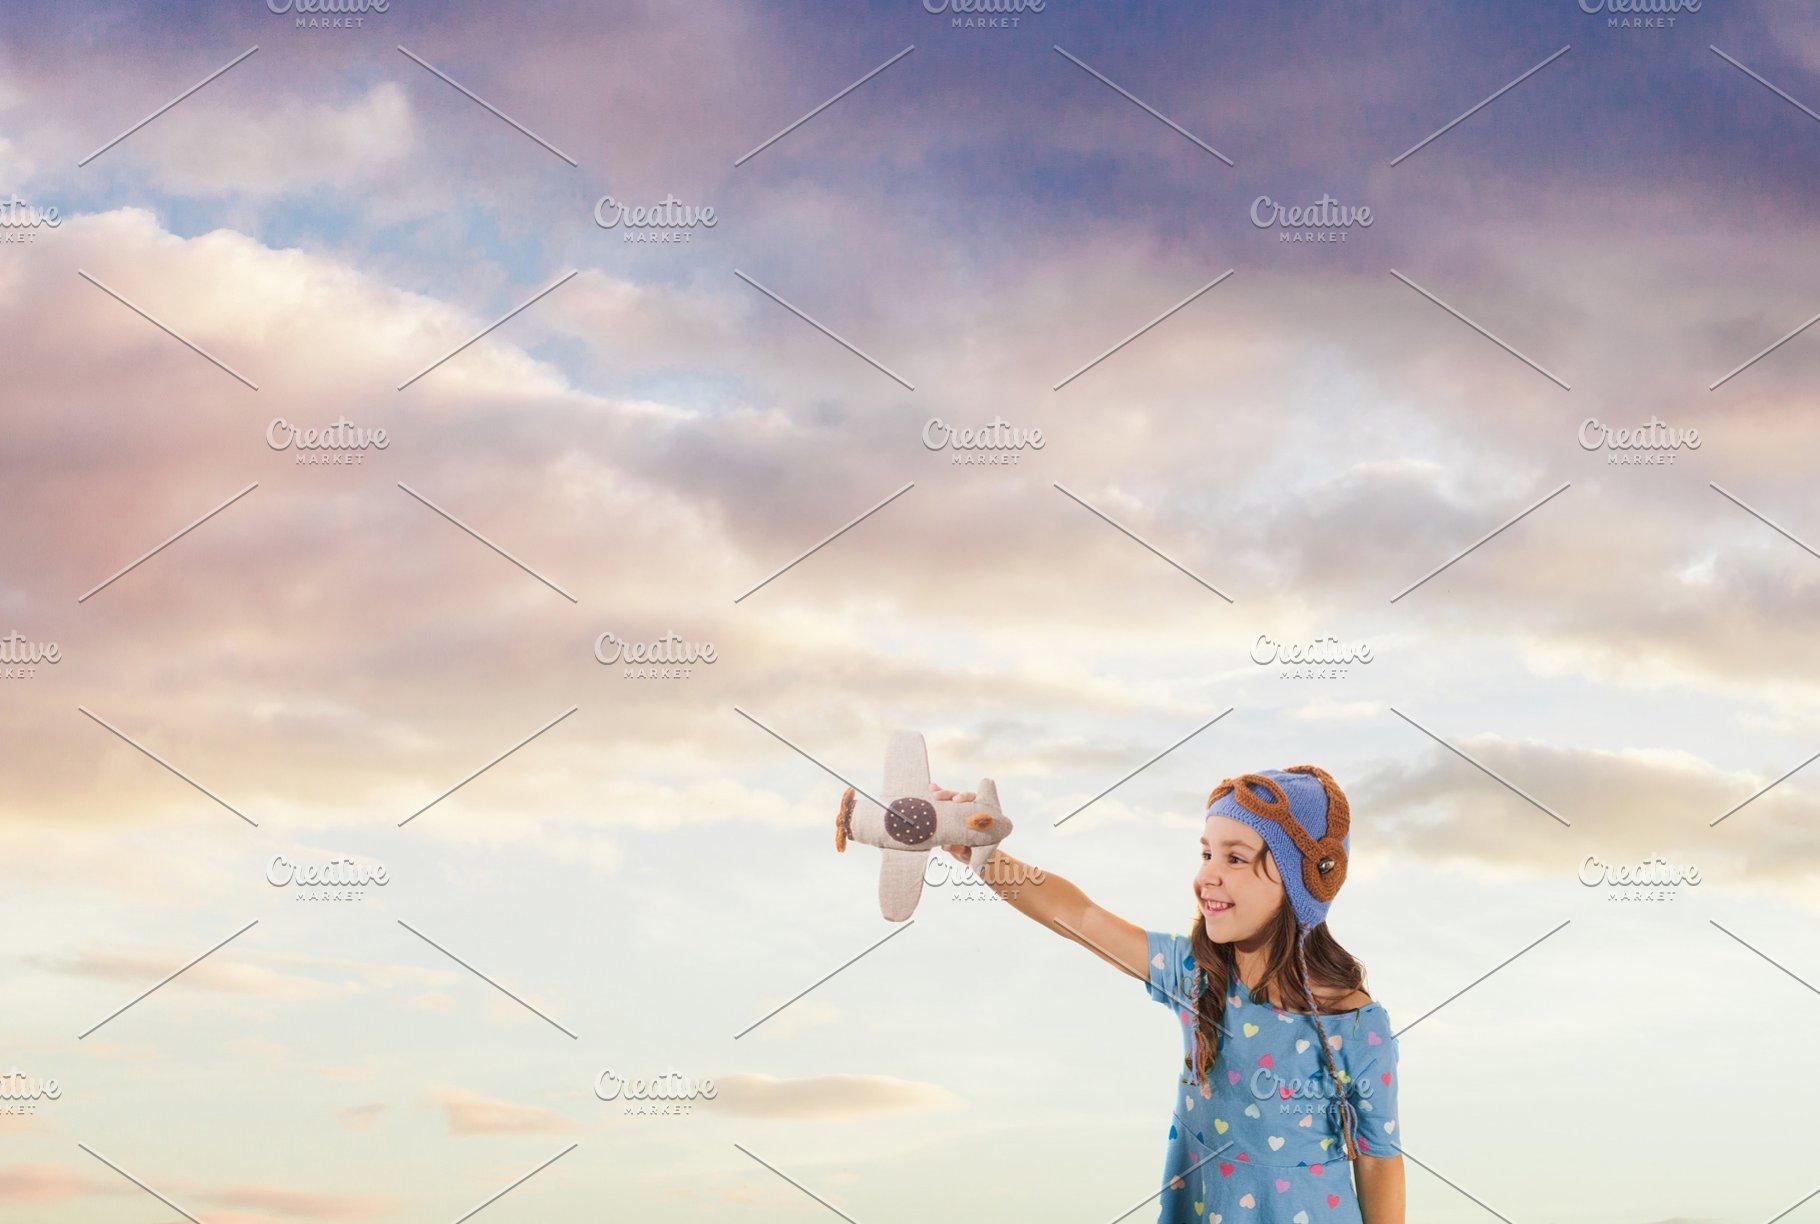 343ae7d419 Cute girl dreaming of summer ~ Holiday Photos ~ Creative Market